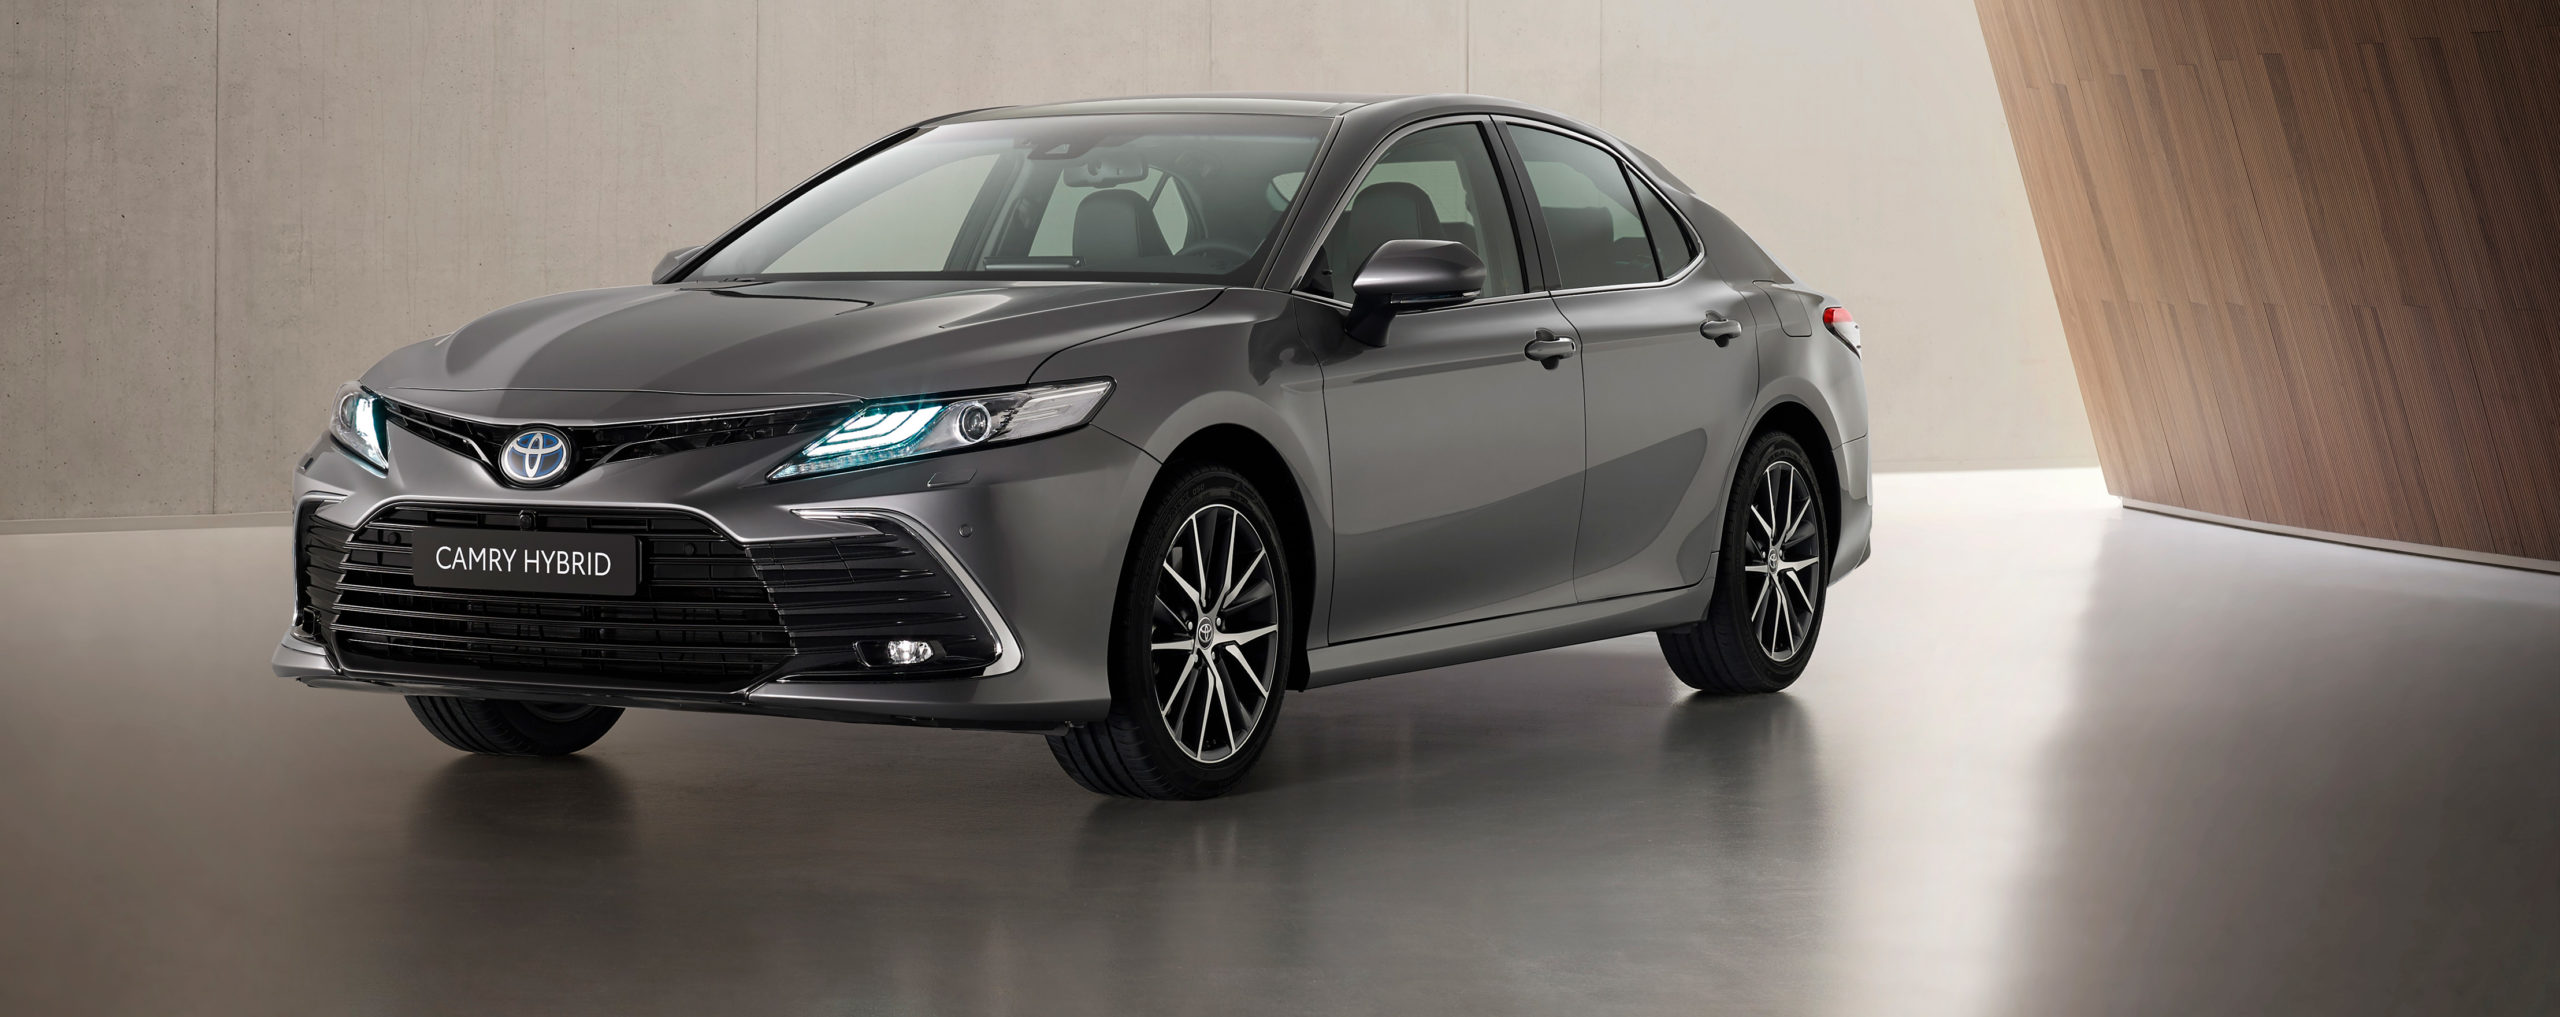 Toyota Camry Electric Hybrid 2021 ya está disponible